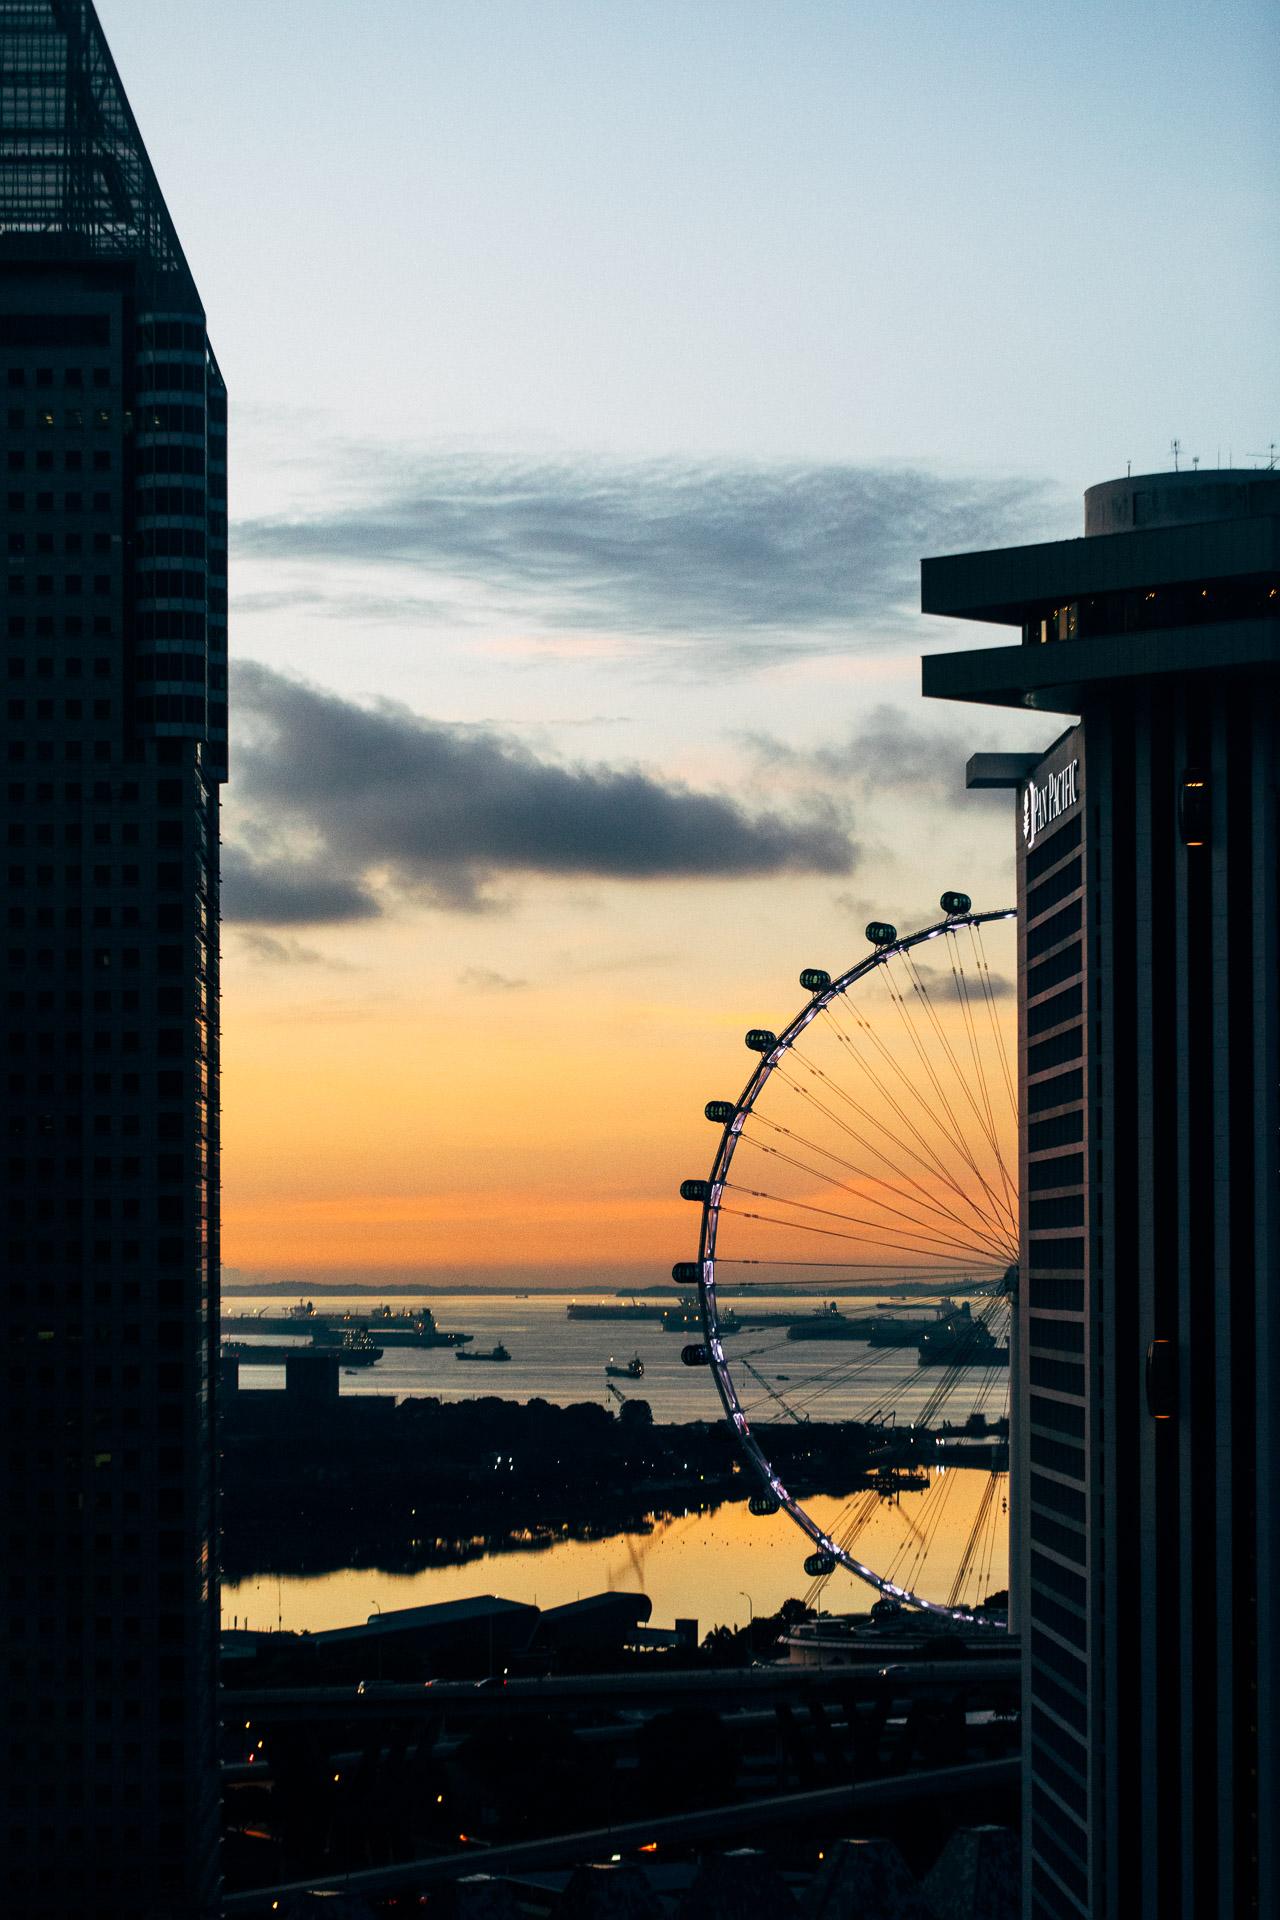 aviation-photographer-lifestyle-china-eastern-singapore-destination--11.jpg